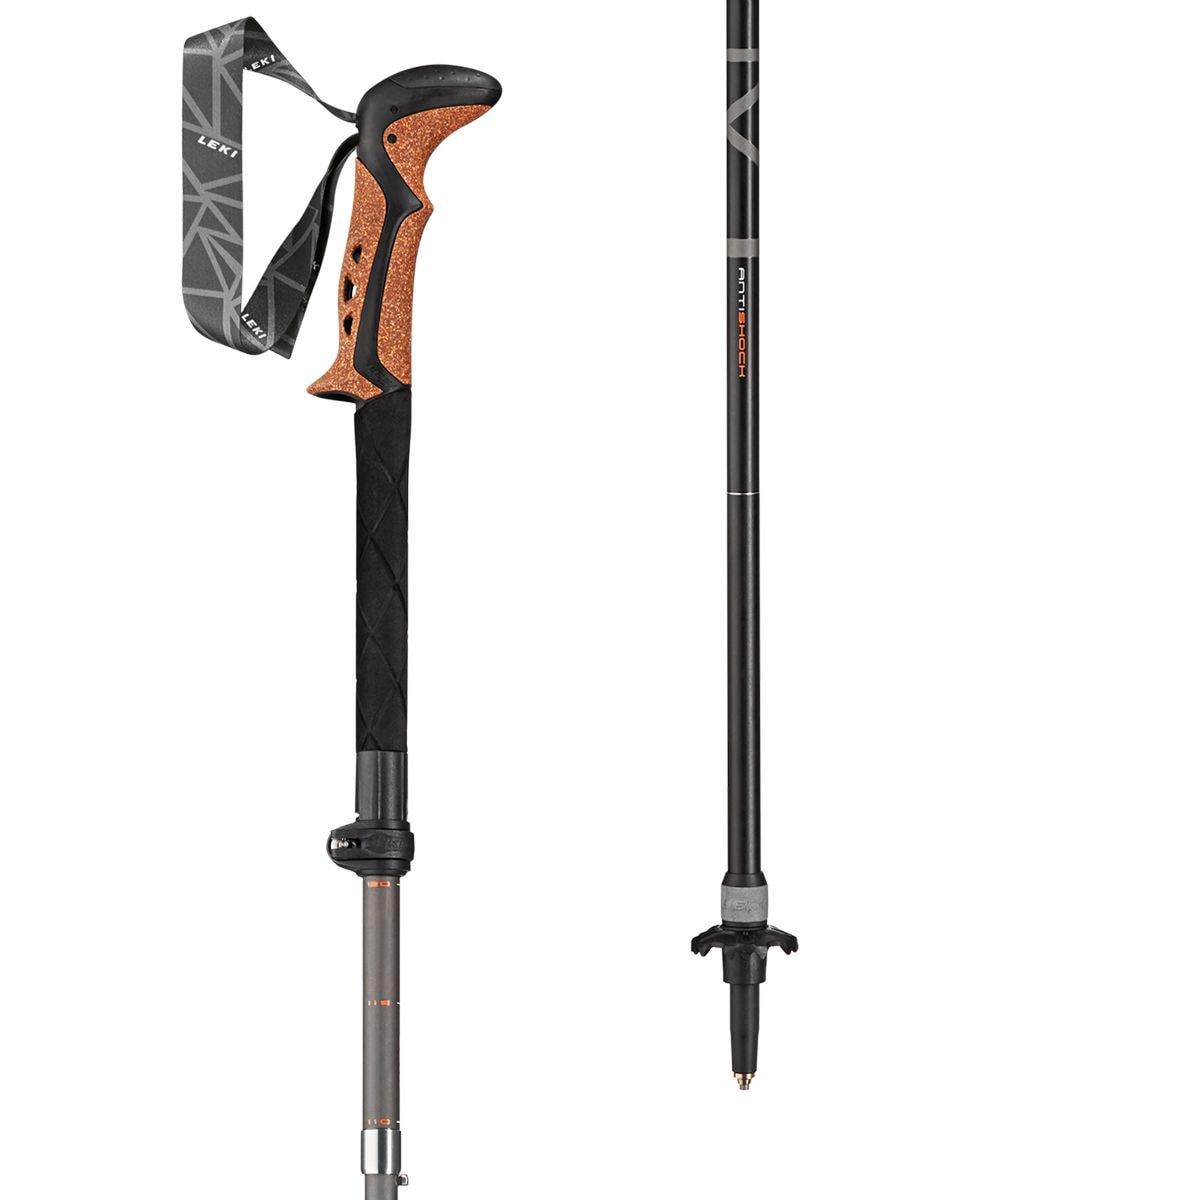 LEKI Micro Vario Cor-Tec TA Trekking Poles One Color, 110-130cm